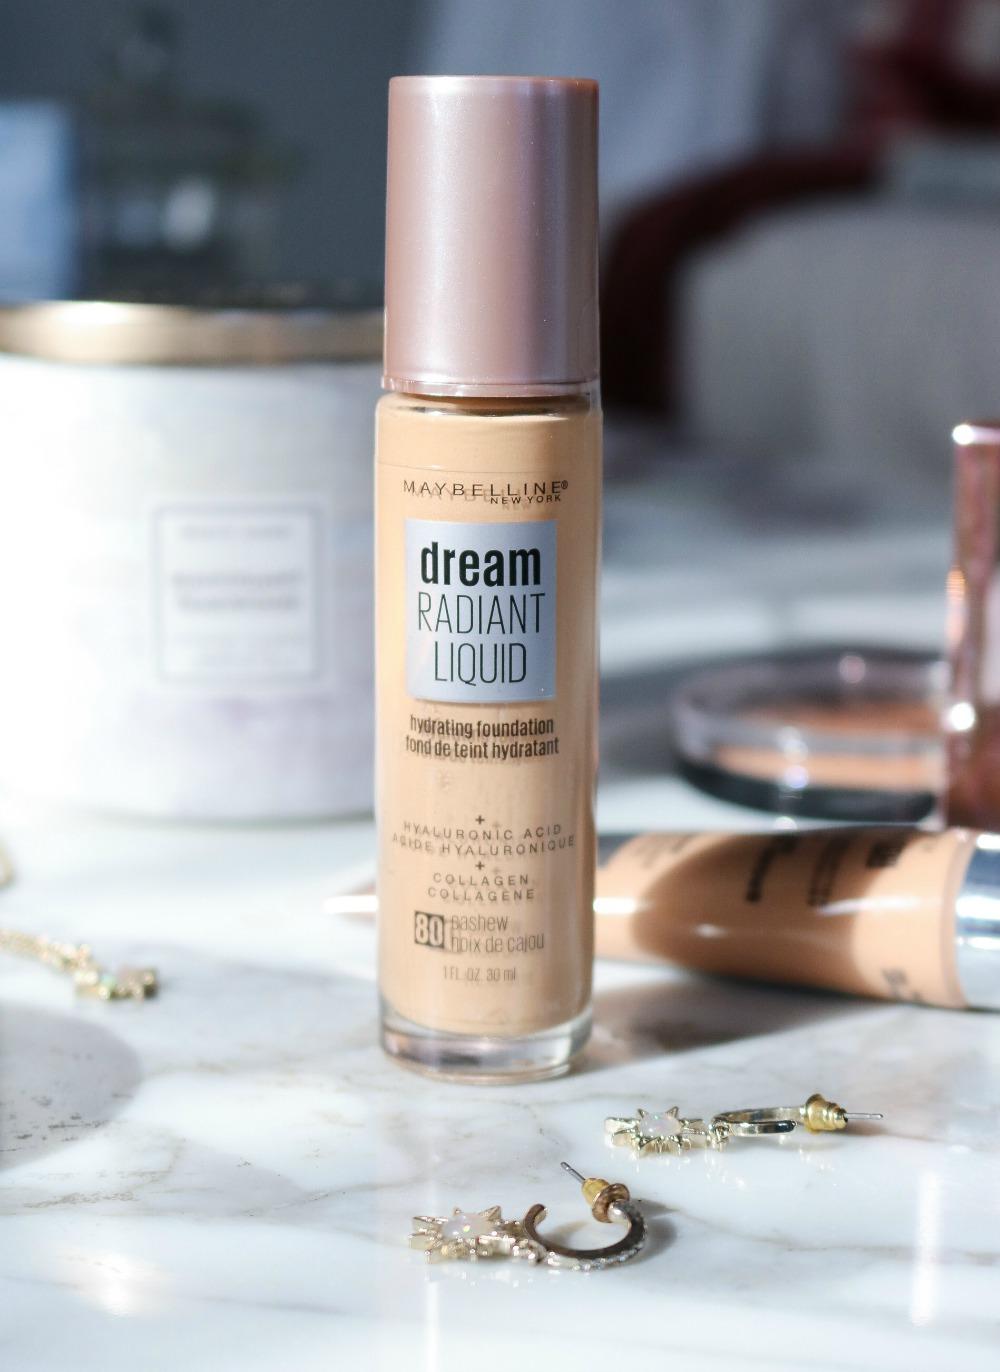 Maybelline Dream Radiant Liquid Foundation Review I Dreaminlace.com